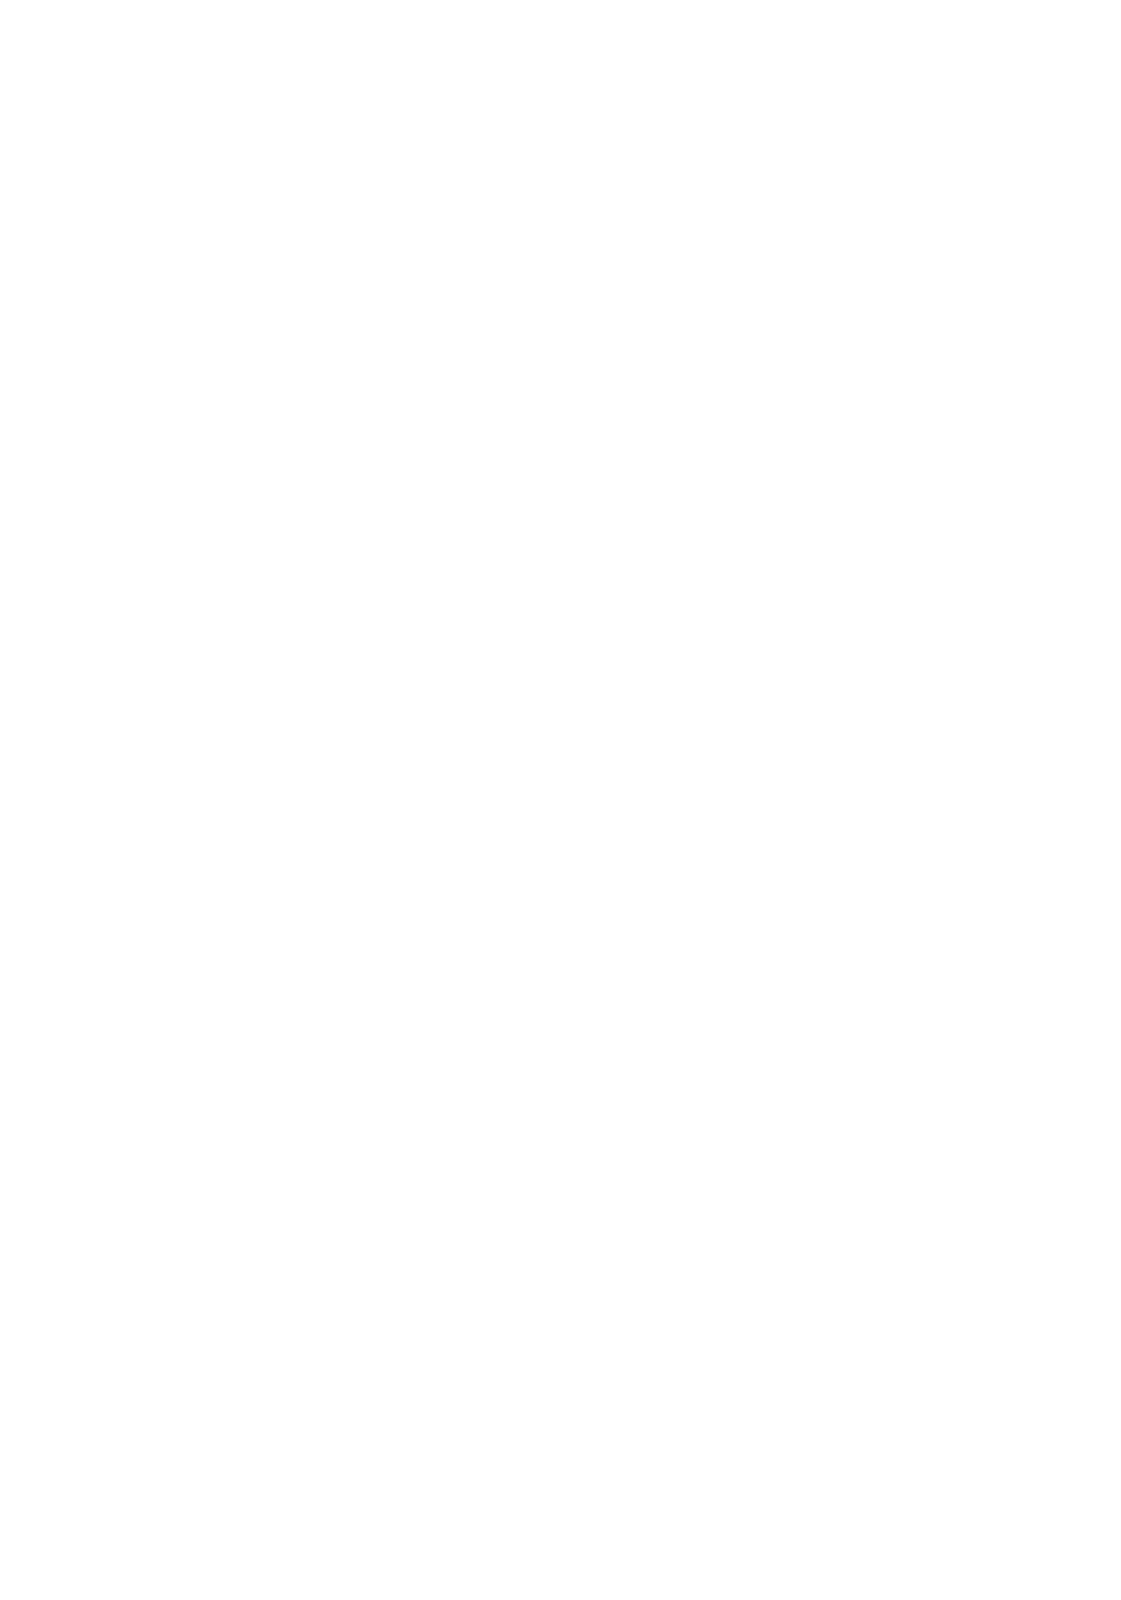 Hitozuma Rankou Kairanban 188